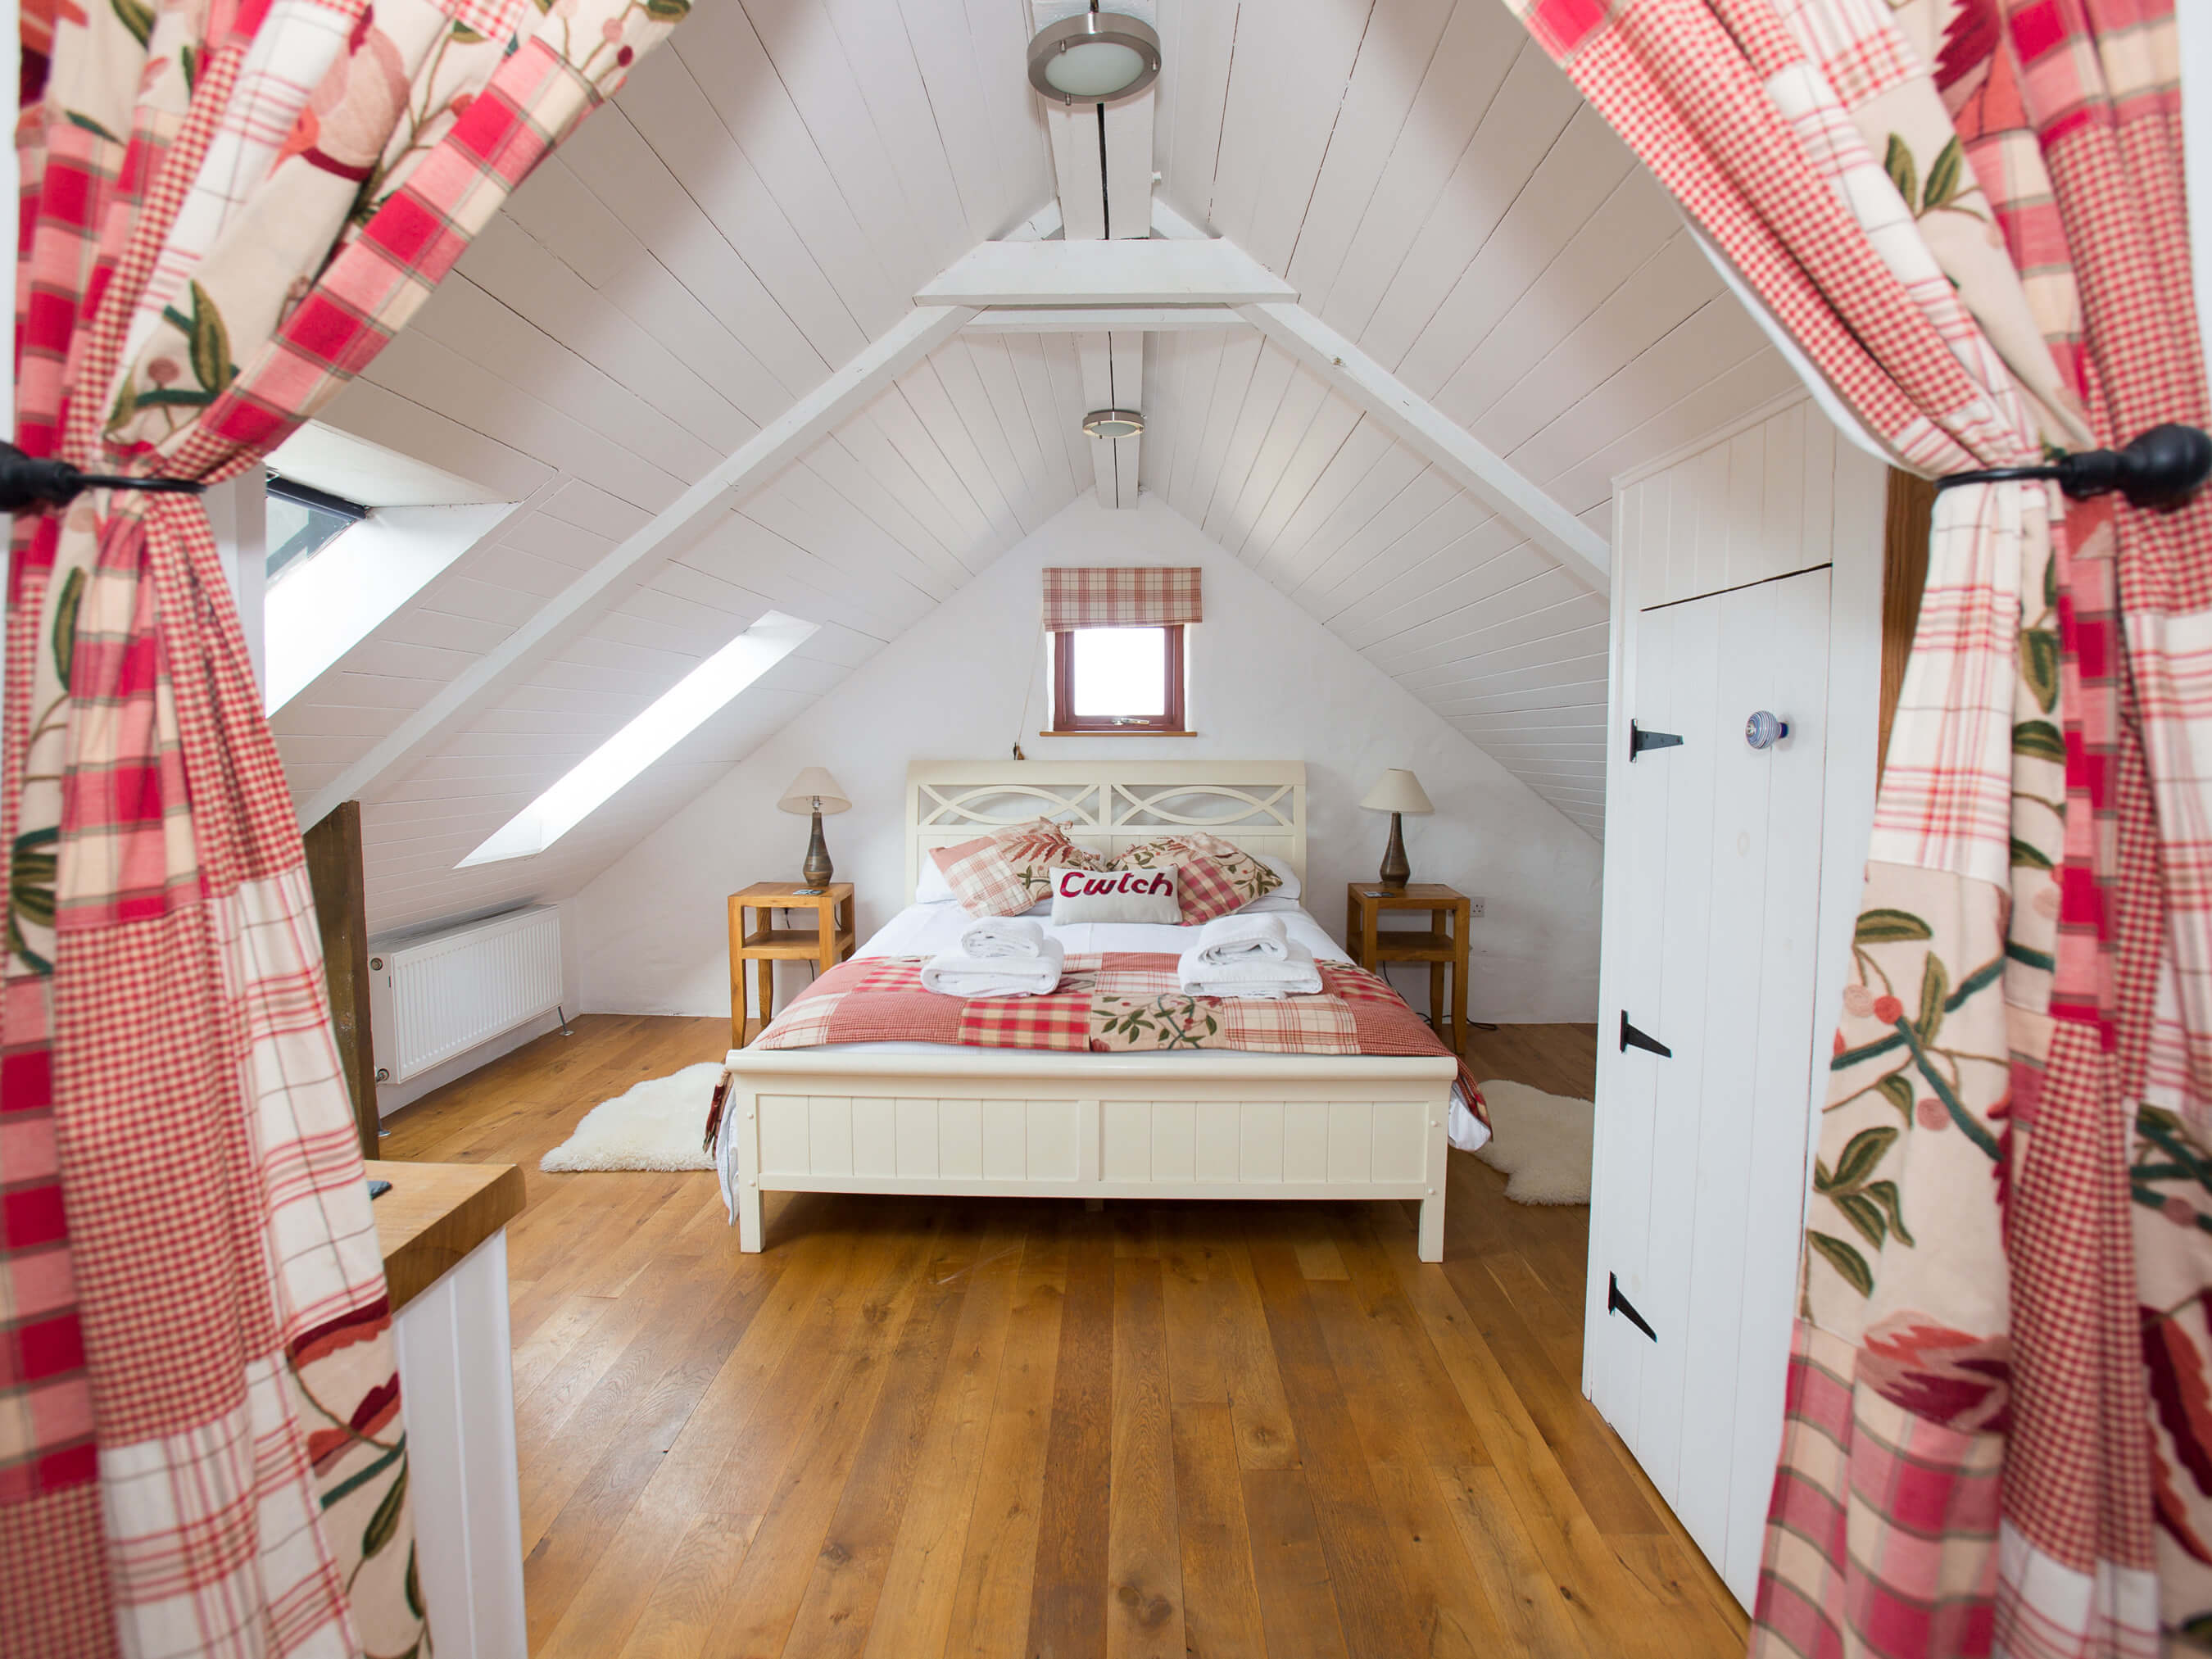 Boia - Porthllisky Farm Cottages